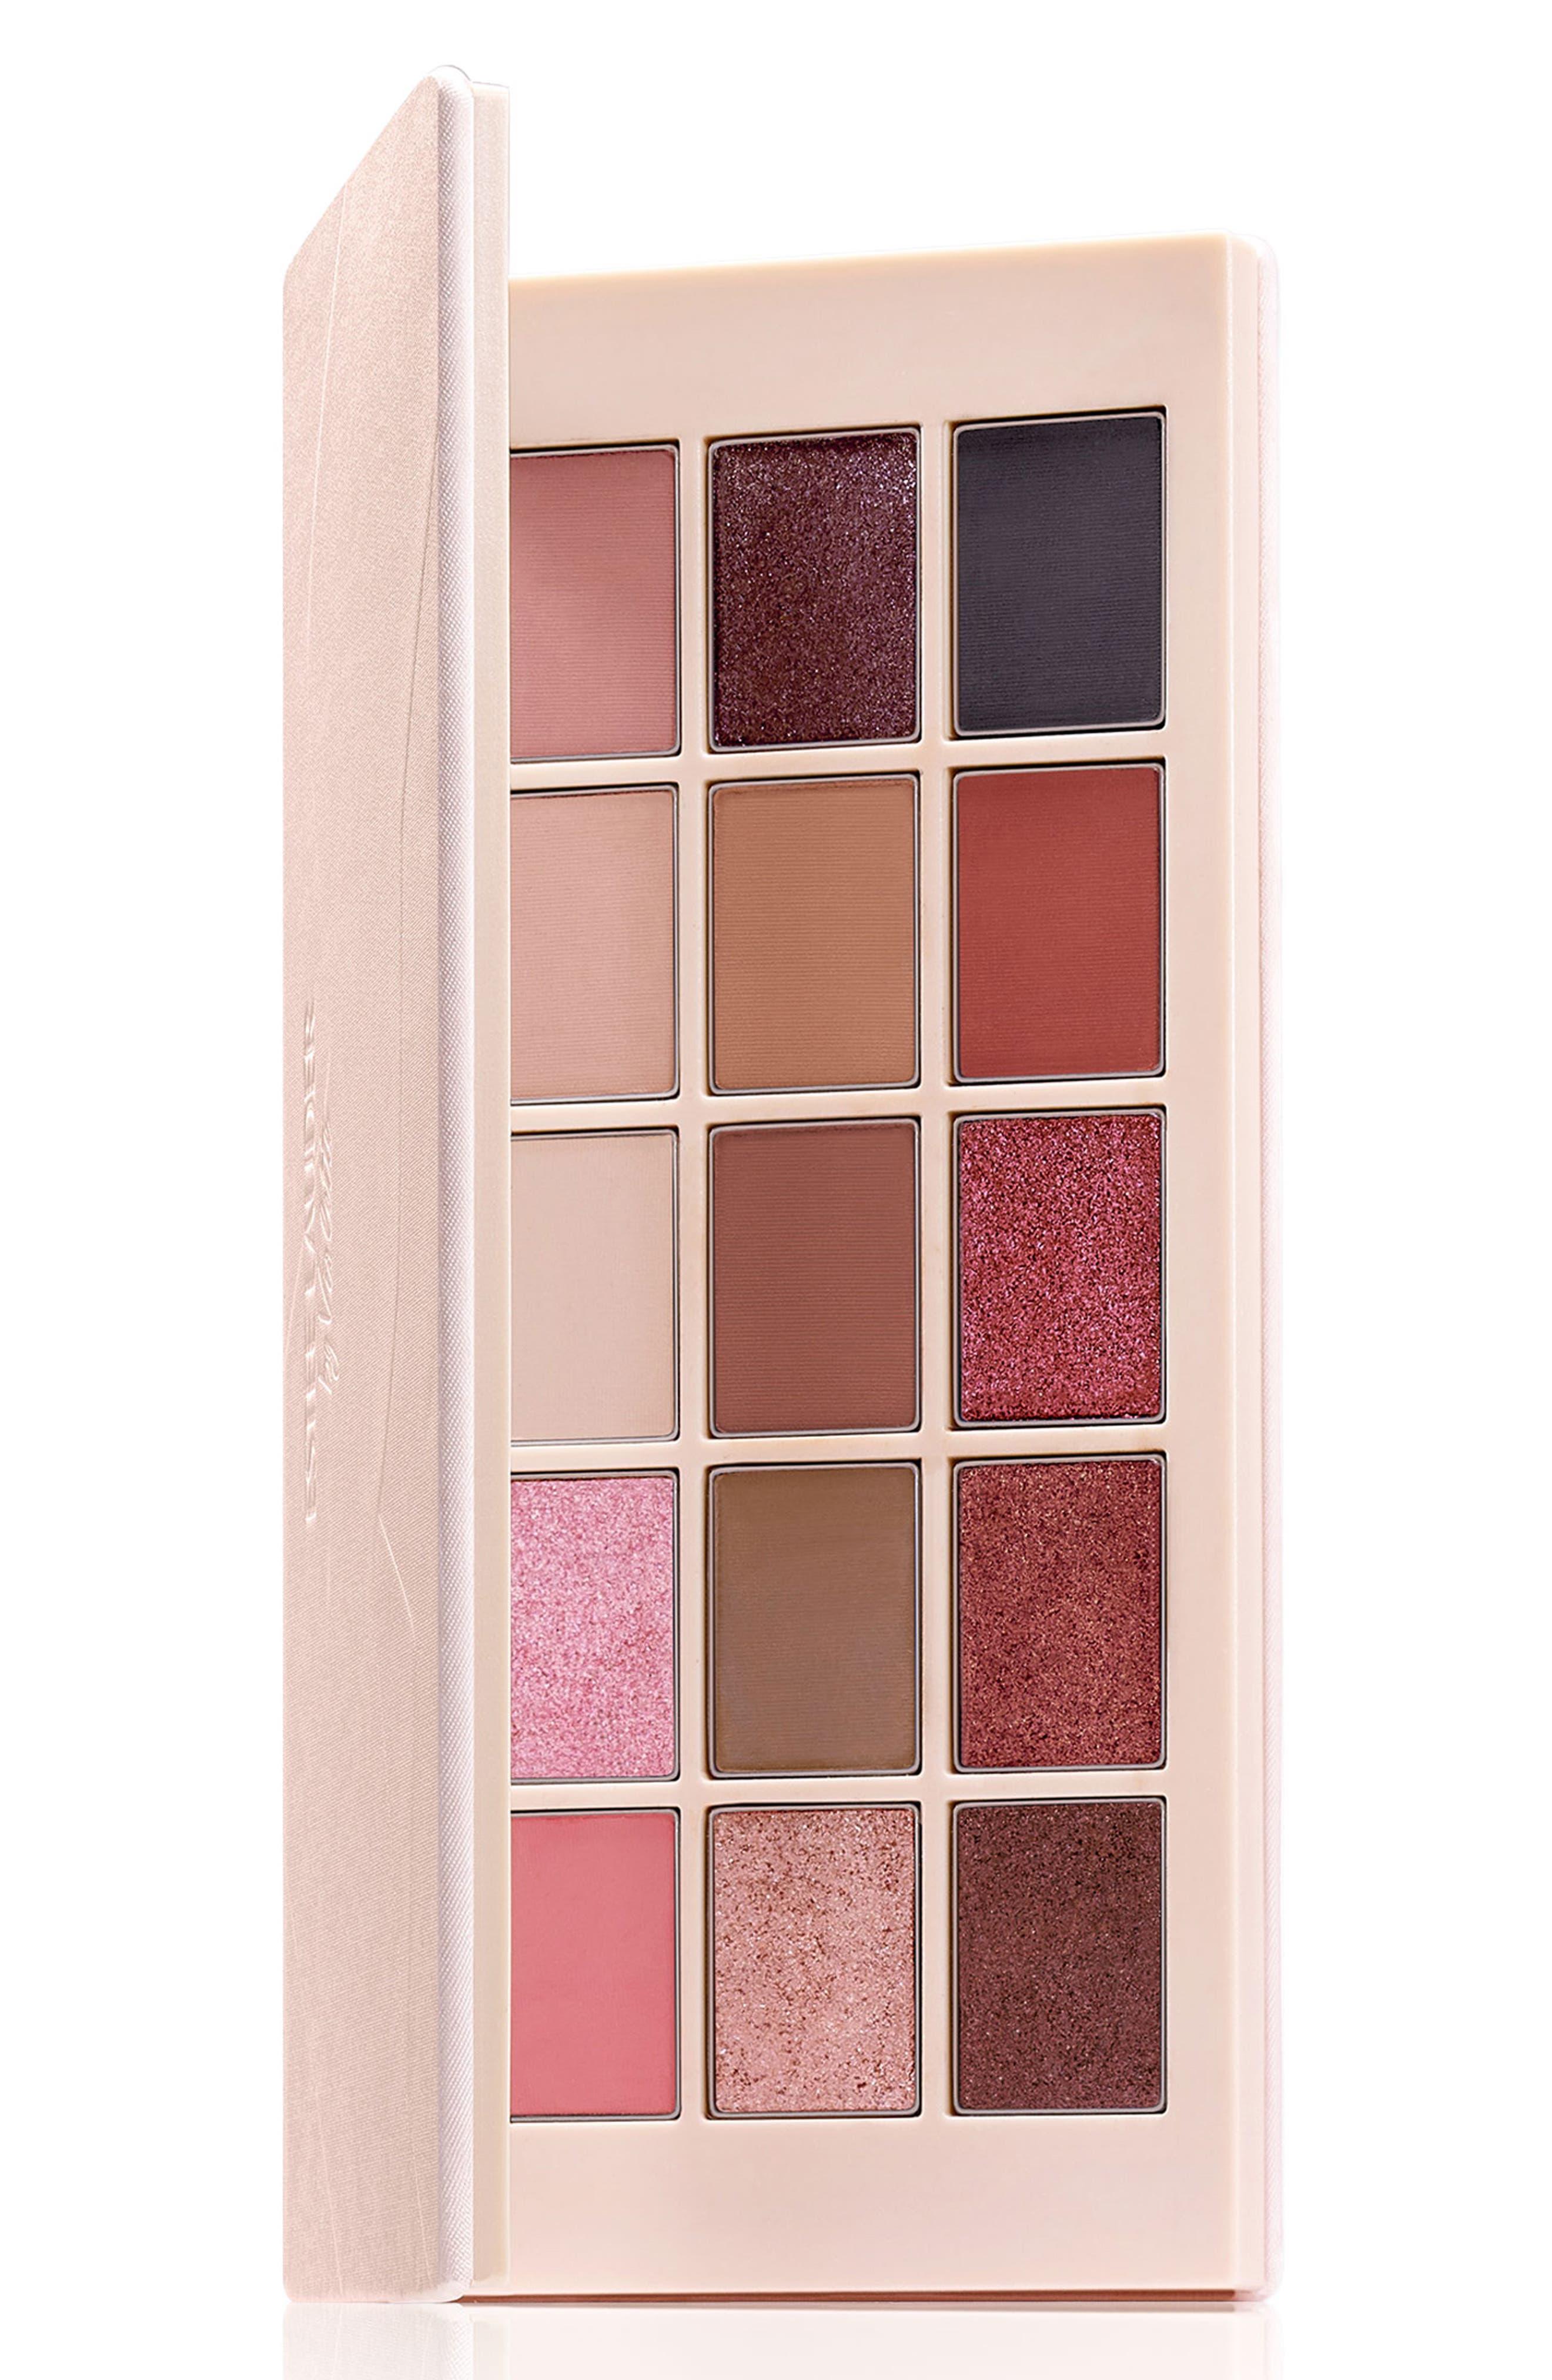 Violette Oh Naturelle! Eyeshadow Palette, Main, color, AMOUR AMOUR